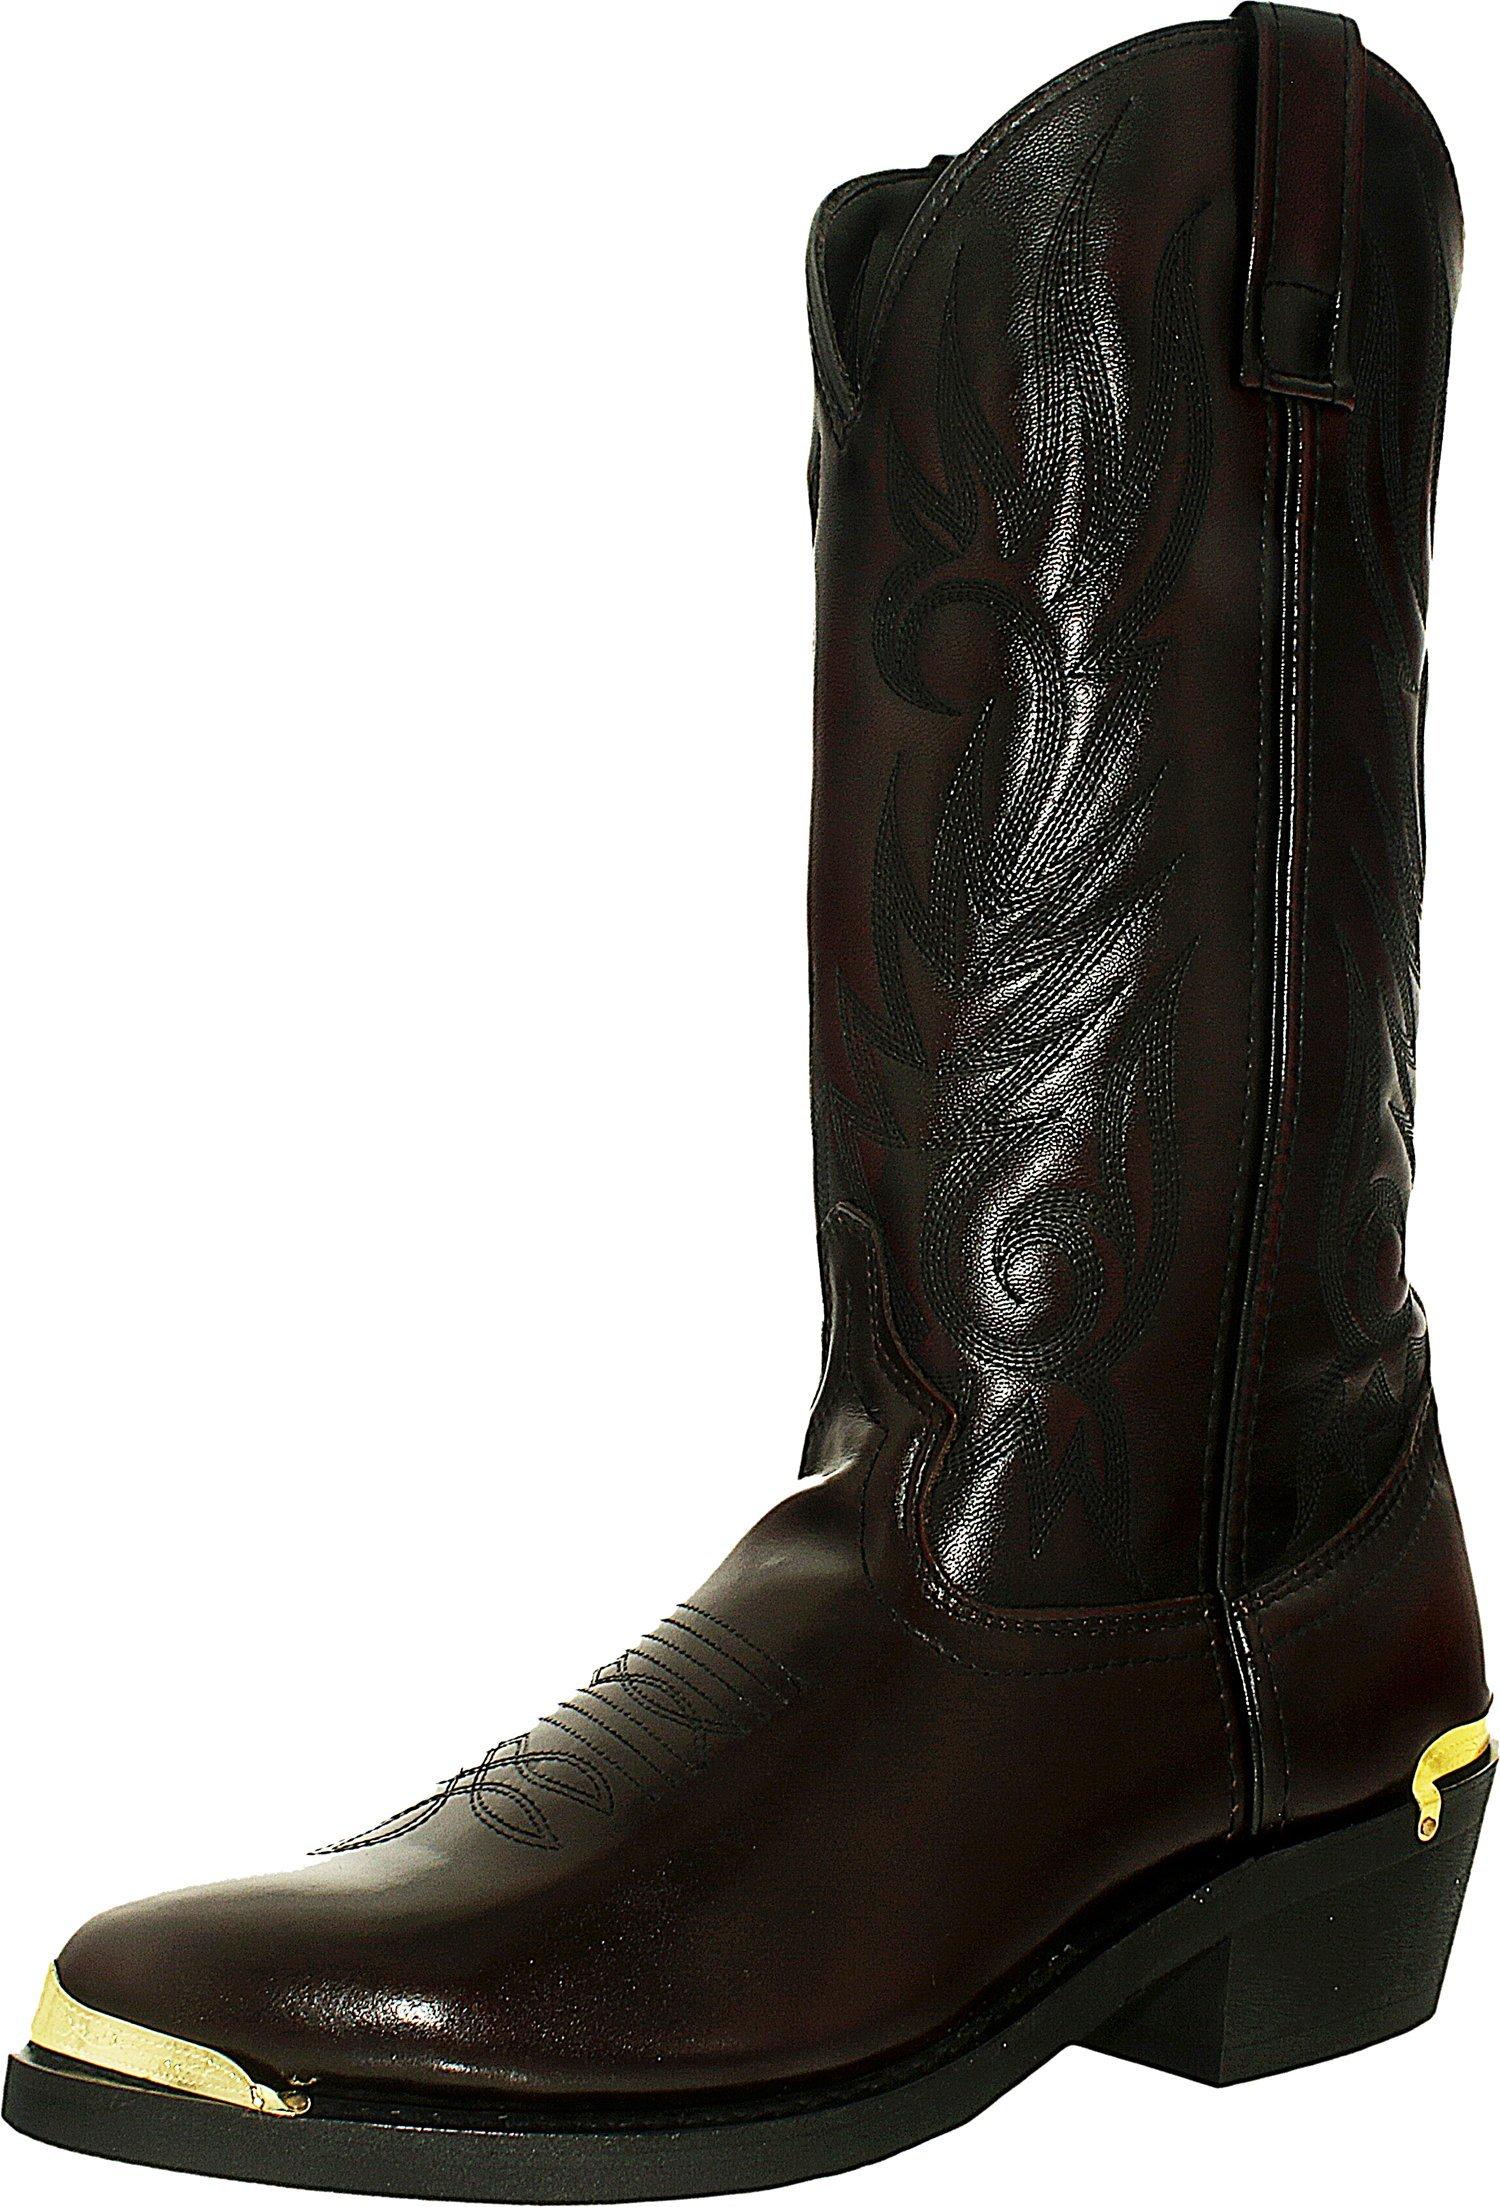 Laredo Mens Black Cherry Leather McComb R Toe 13in Cowboy Boots 7 EW